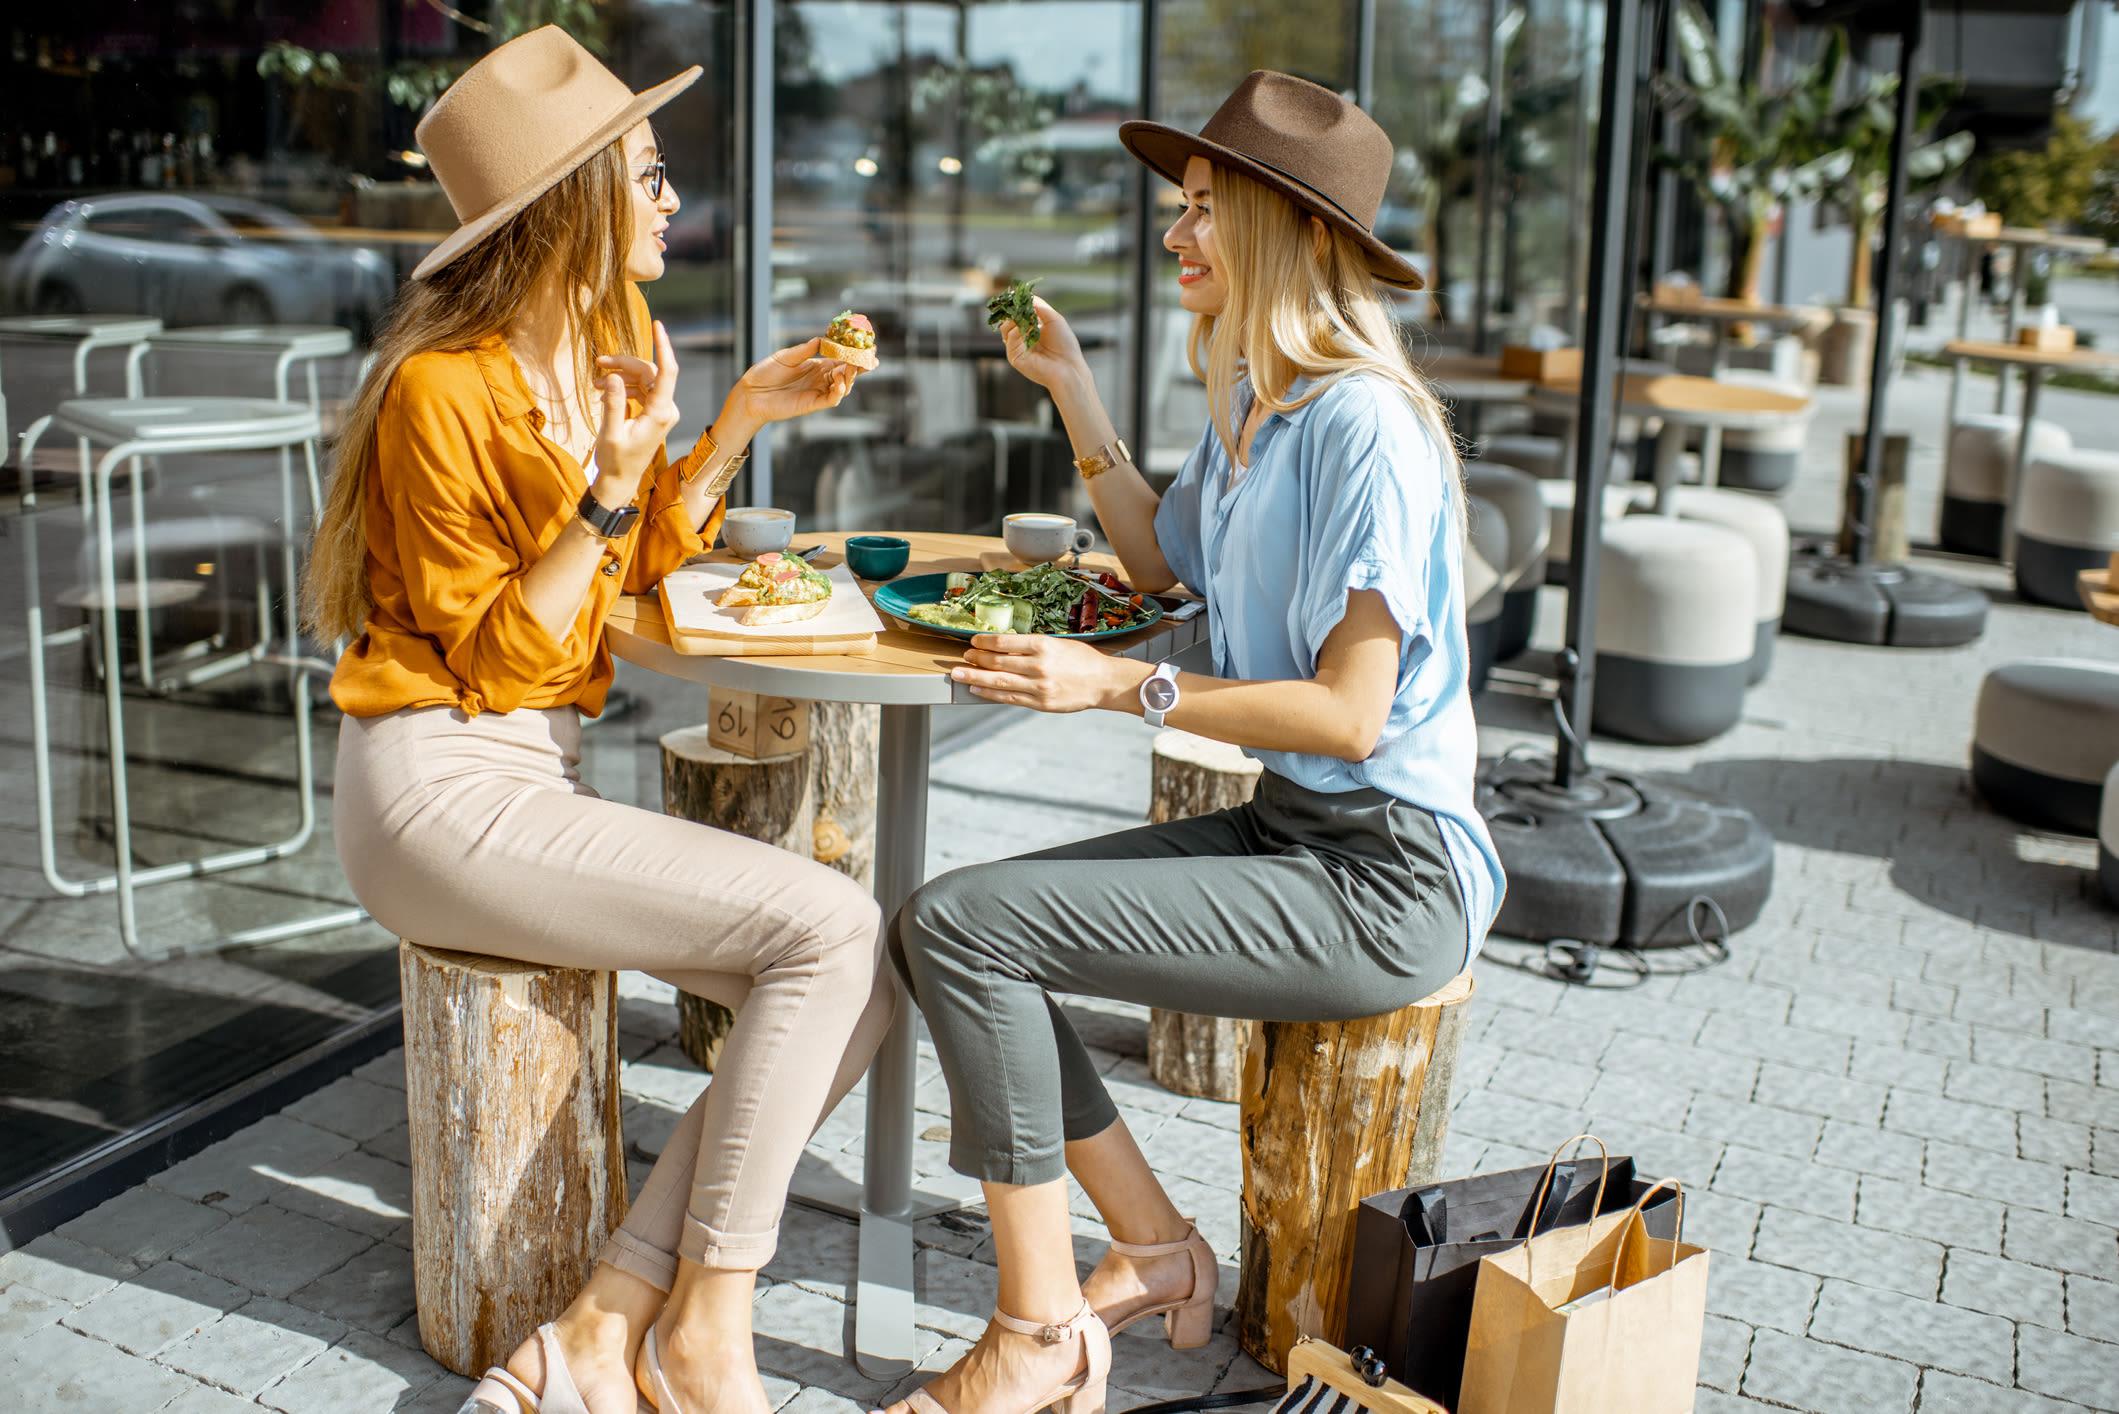 Residents eating outdoors near Highland Square in Atlanta, Georgia